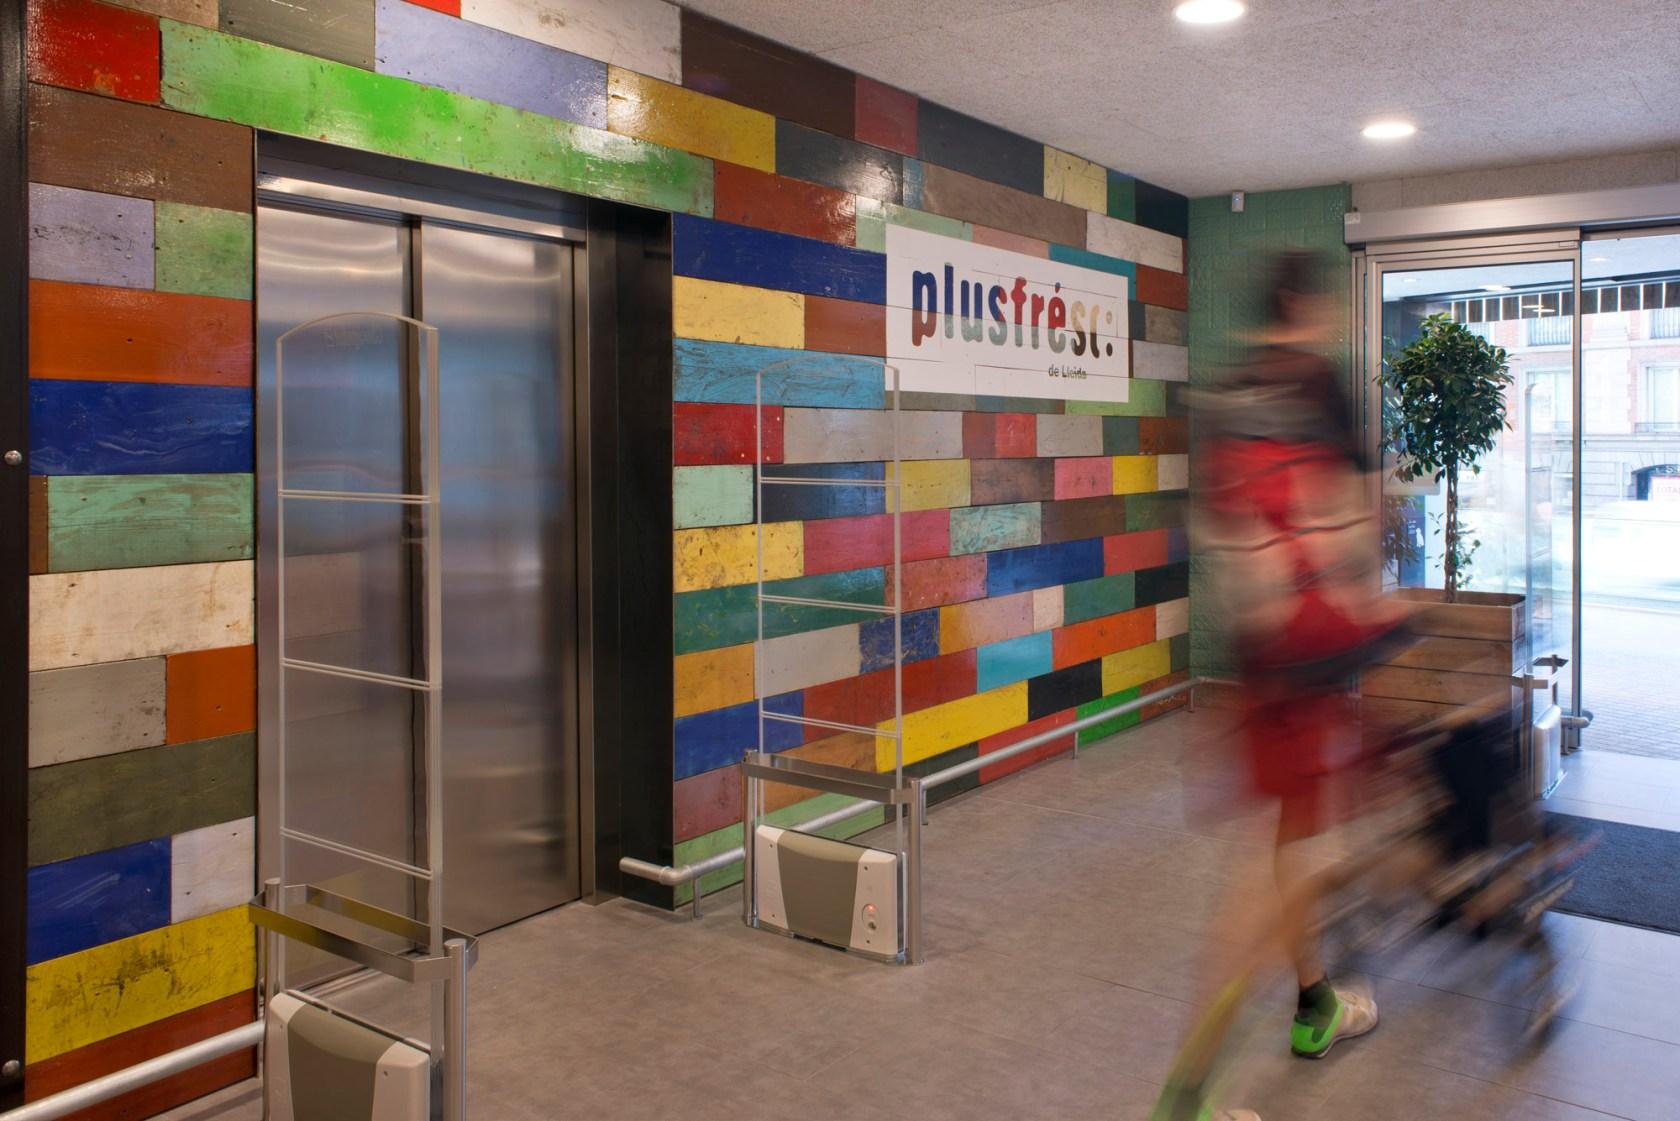 Plusfresc Supermarket - Architizer